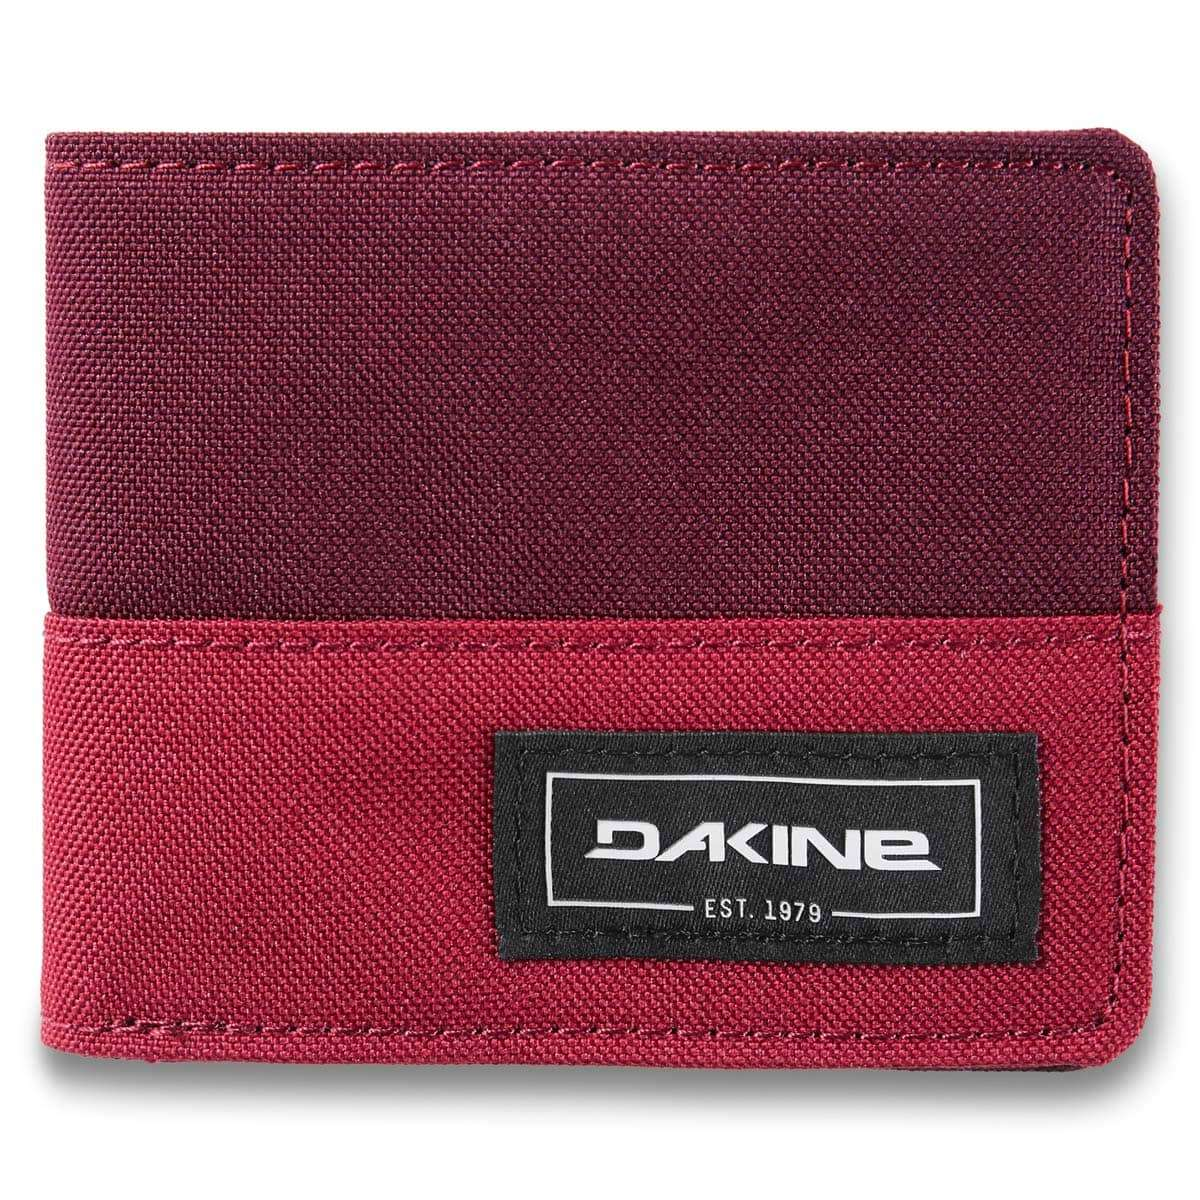 Payback Mini Karte.Dakine Payback Wallet Garnet Shadow